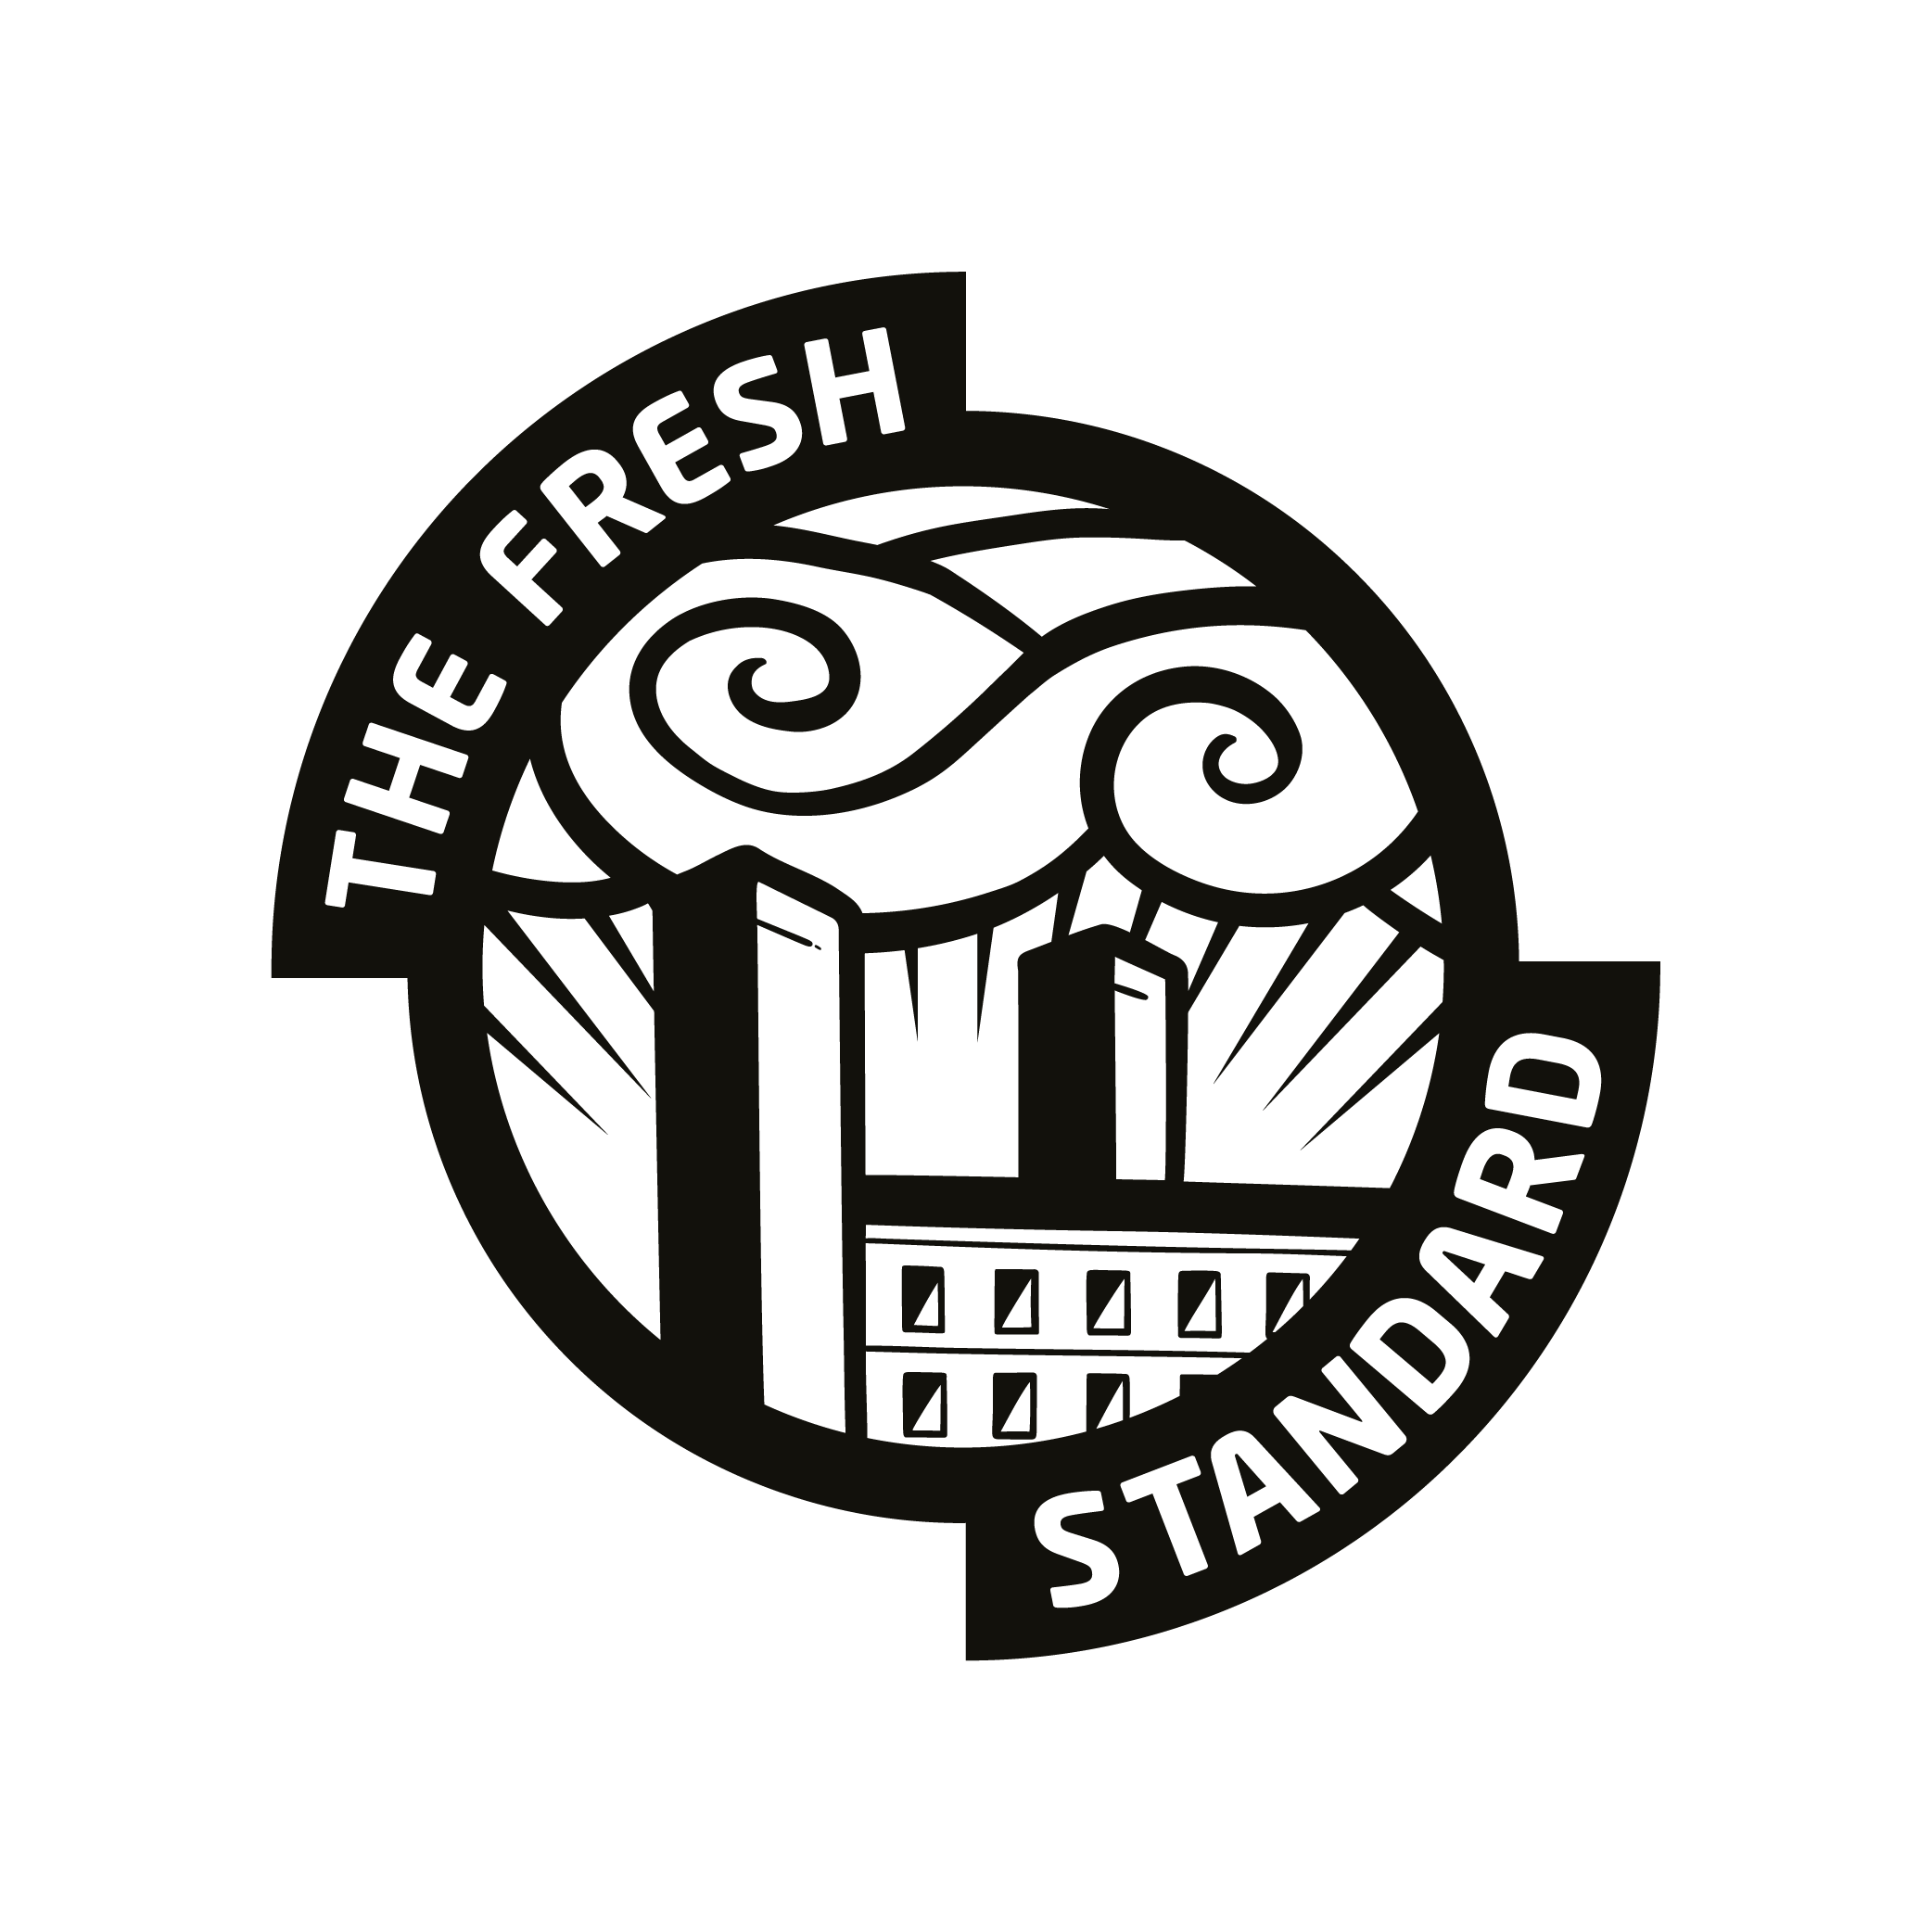 The Fresh Standard Brew Co